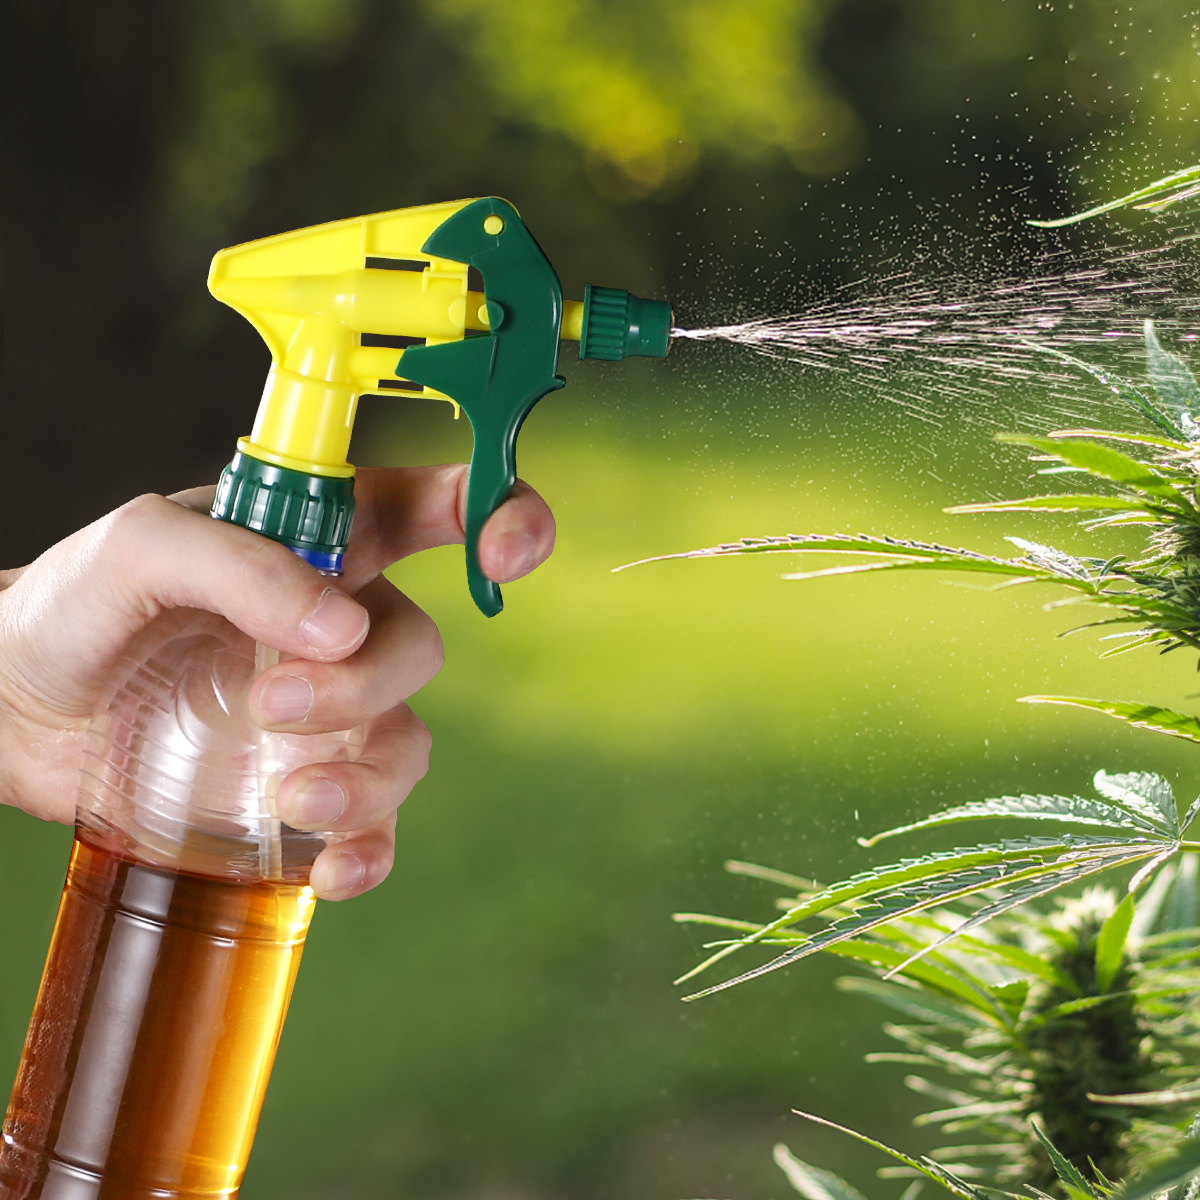 10pcs Universal Spray Bottle Trigger Replacement Plastic Spray Nozzles Thicken Sprayer Replacement Trigger Spray Tops Spray Head-4